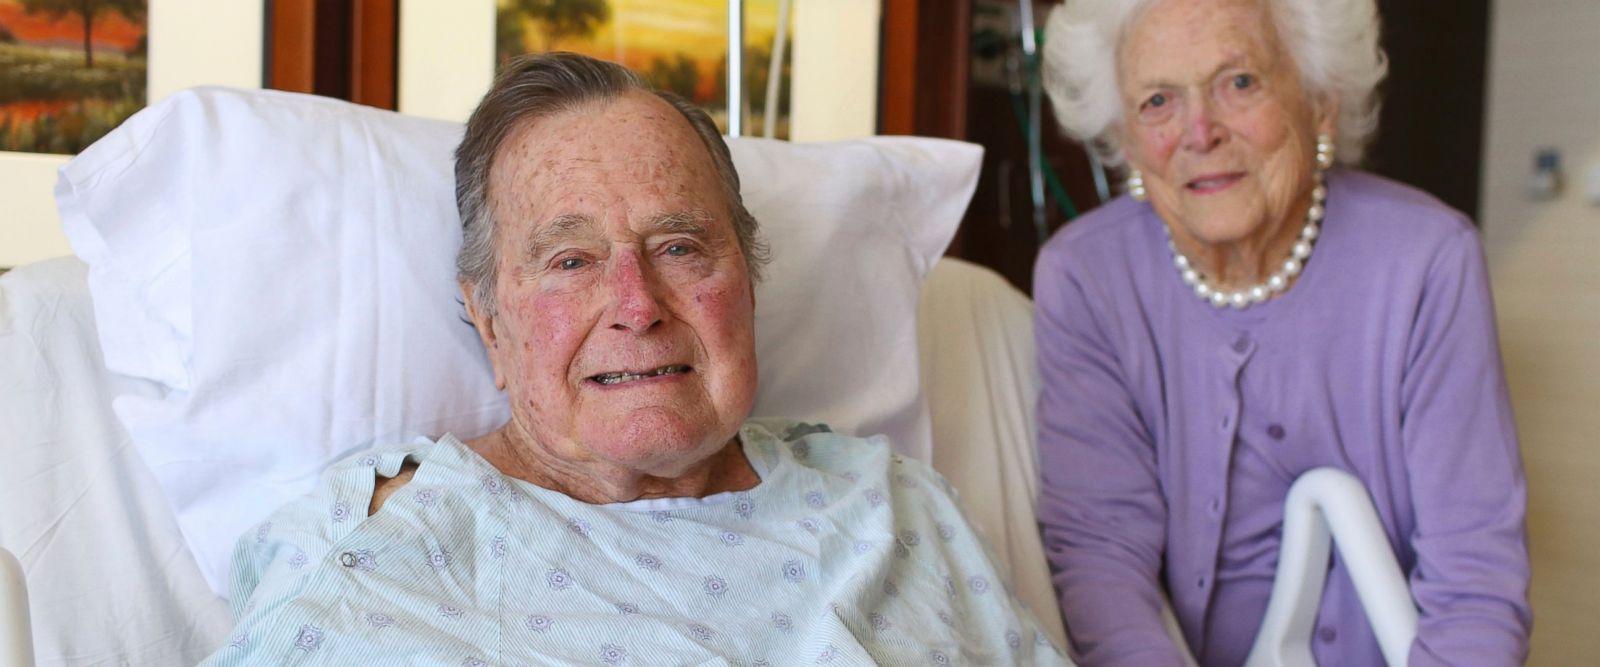 Bush Recovering From Pneumonia